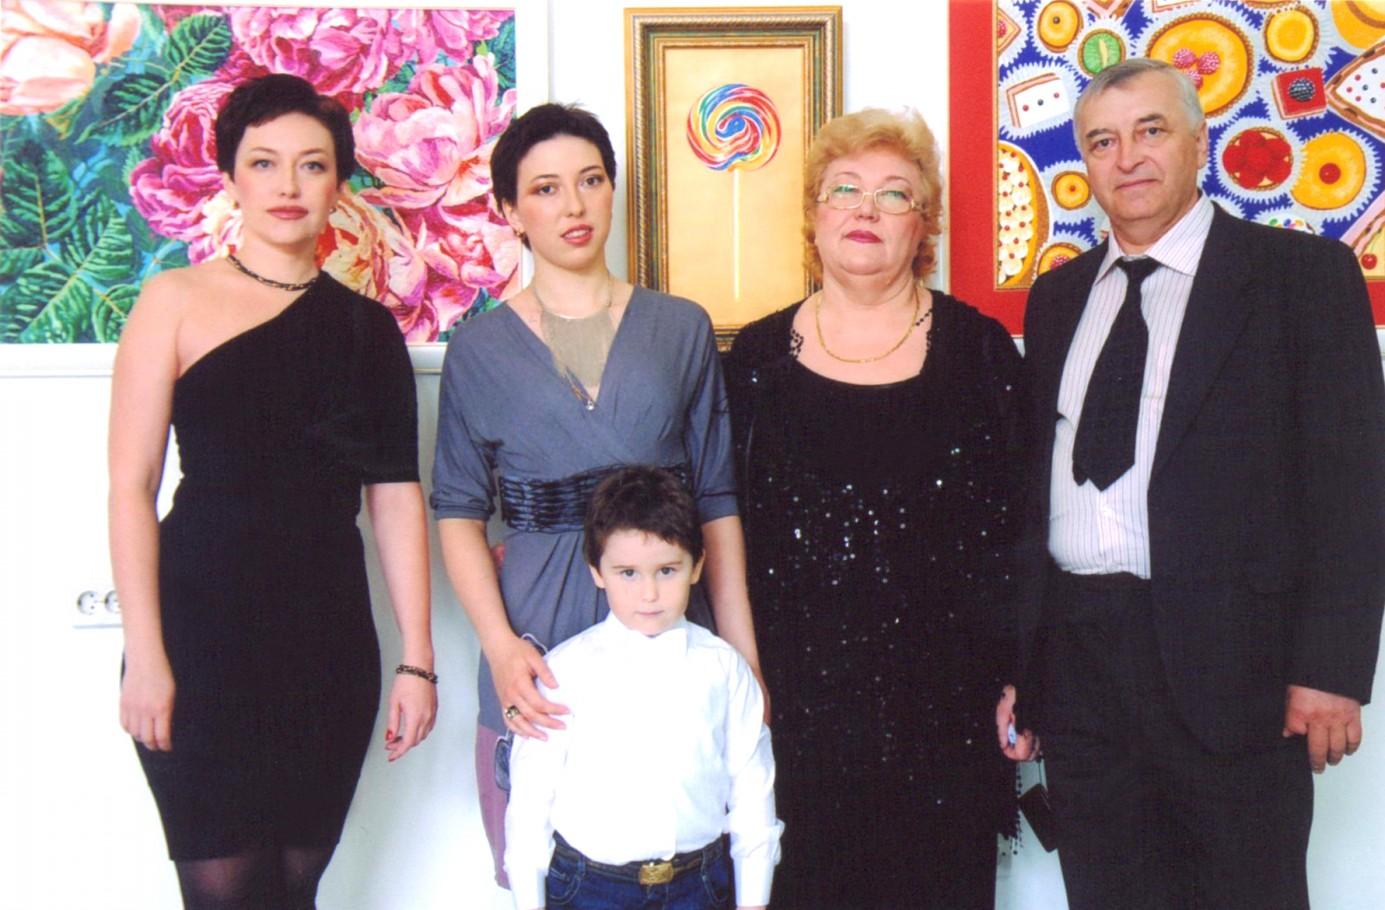 Ирина Чернаева, Олеся Зорина (сестра), Чернавин Никита (сын), Бандура Нина (мама), Бандура Алексей (папа)